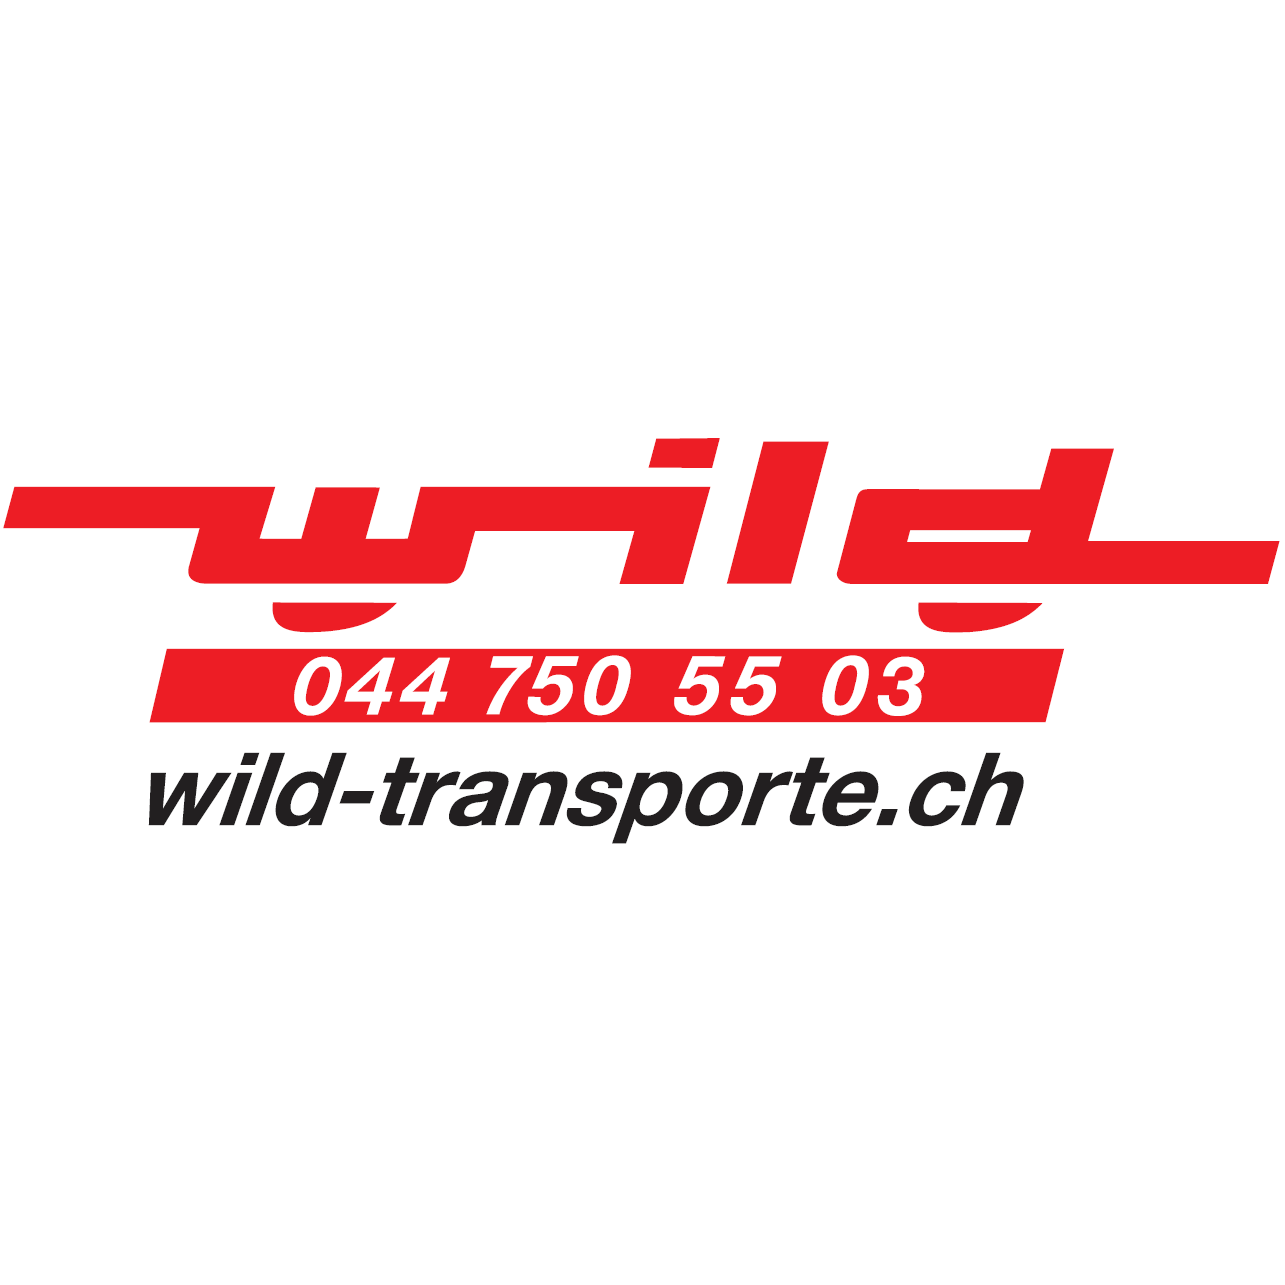 Wild Transporte AG